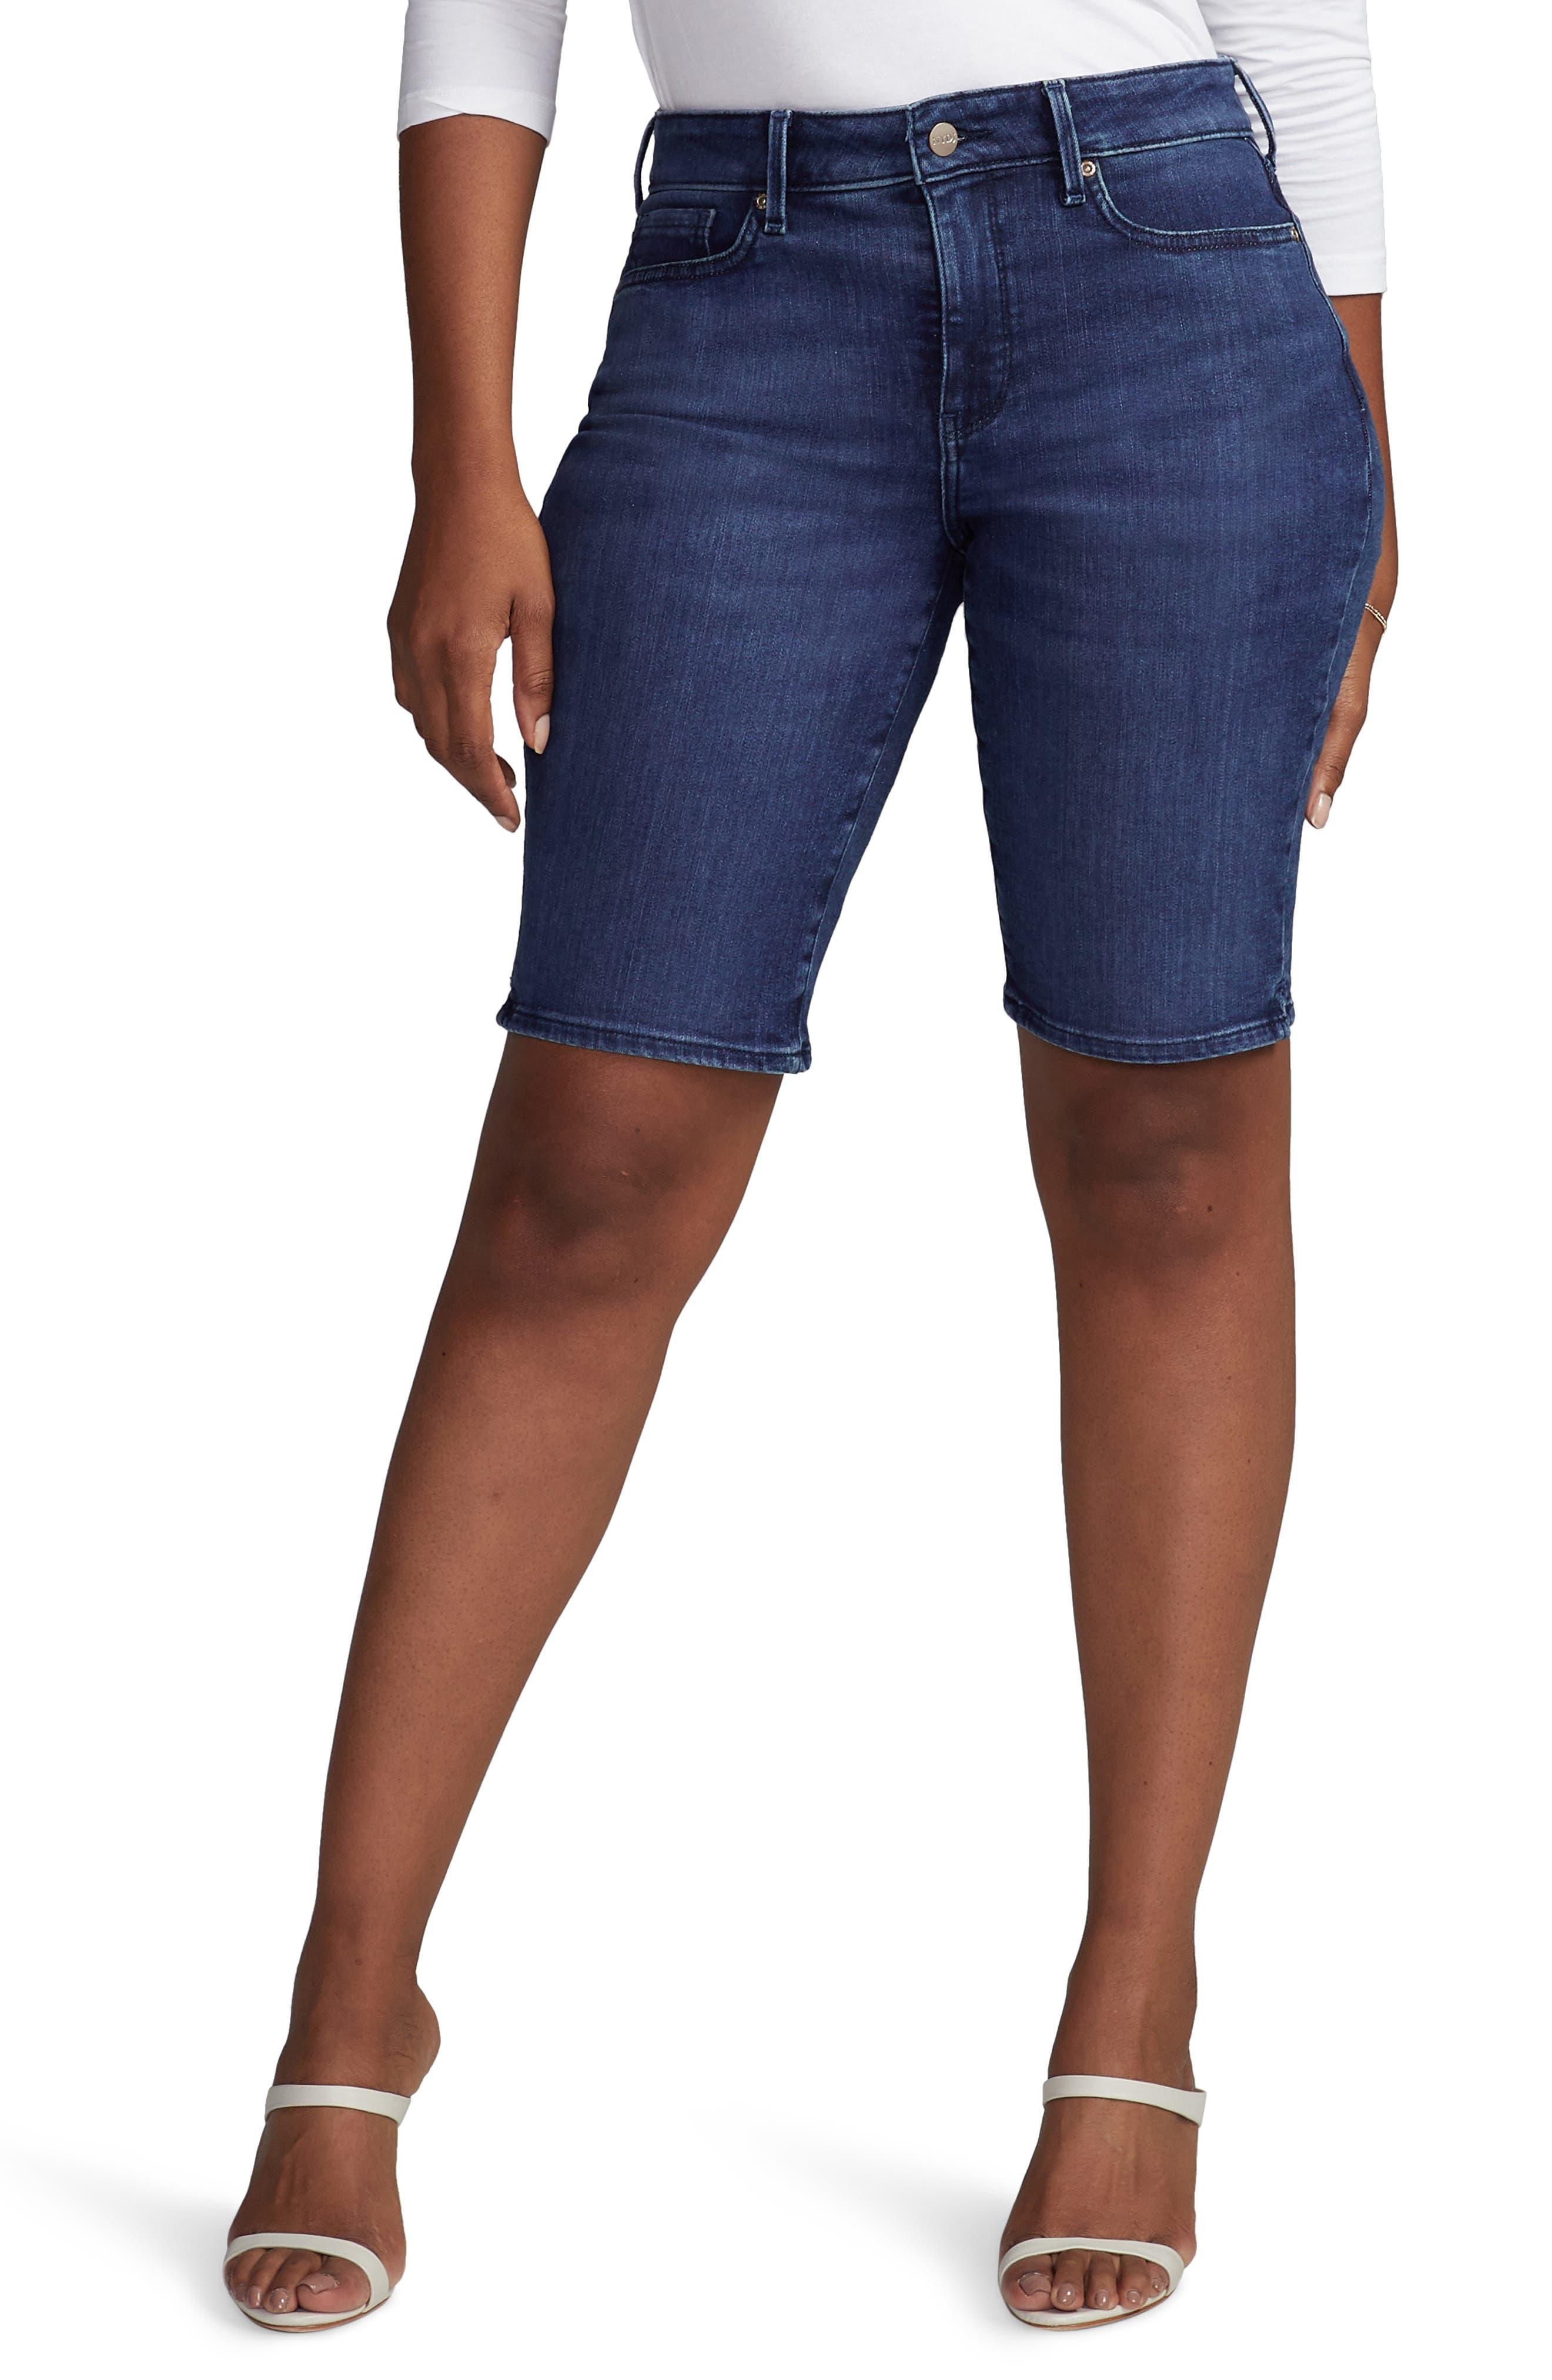 Plus Women's Curves 360 By NYDJ Side Slit Denim Shorts